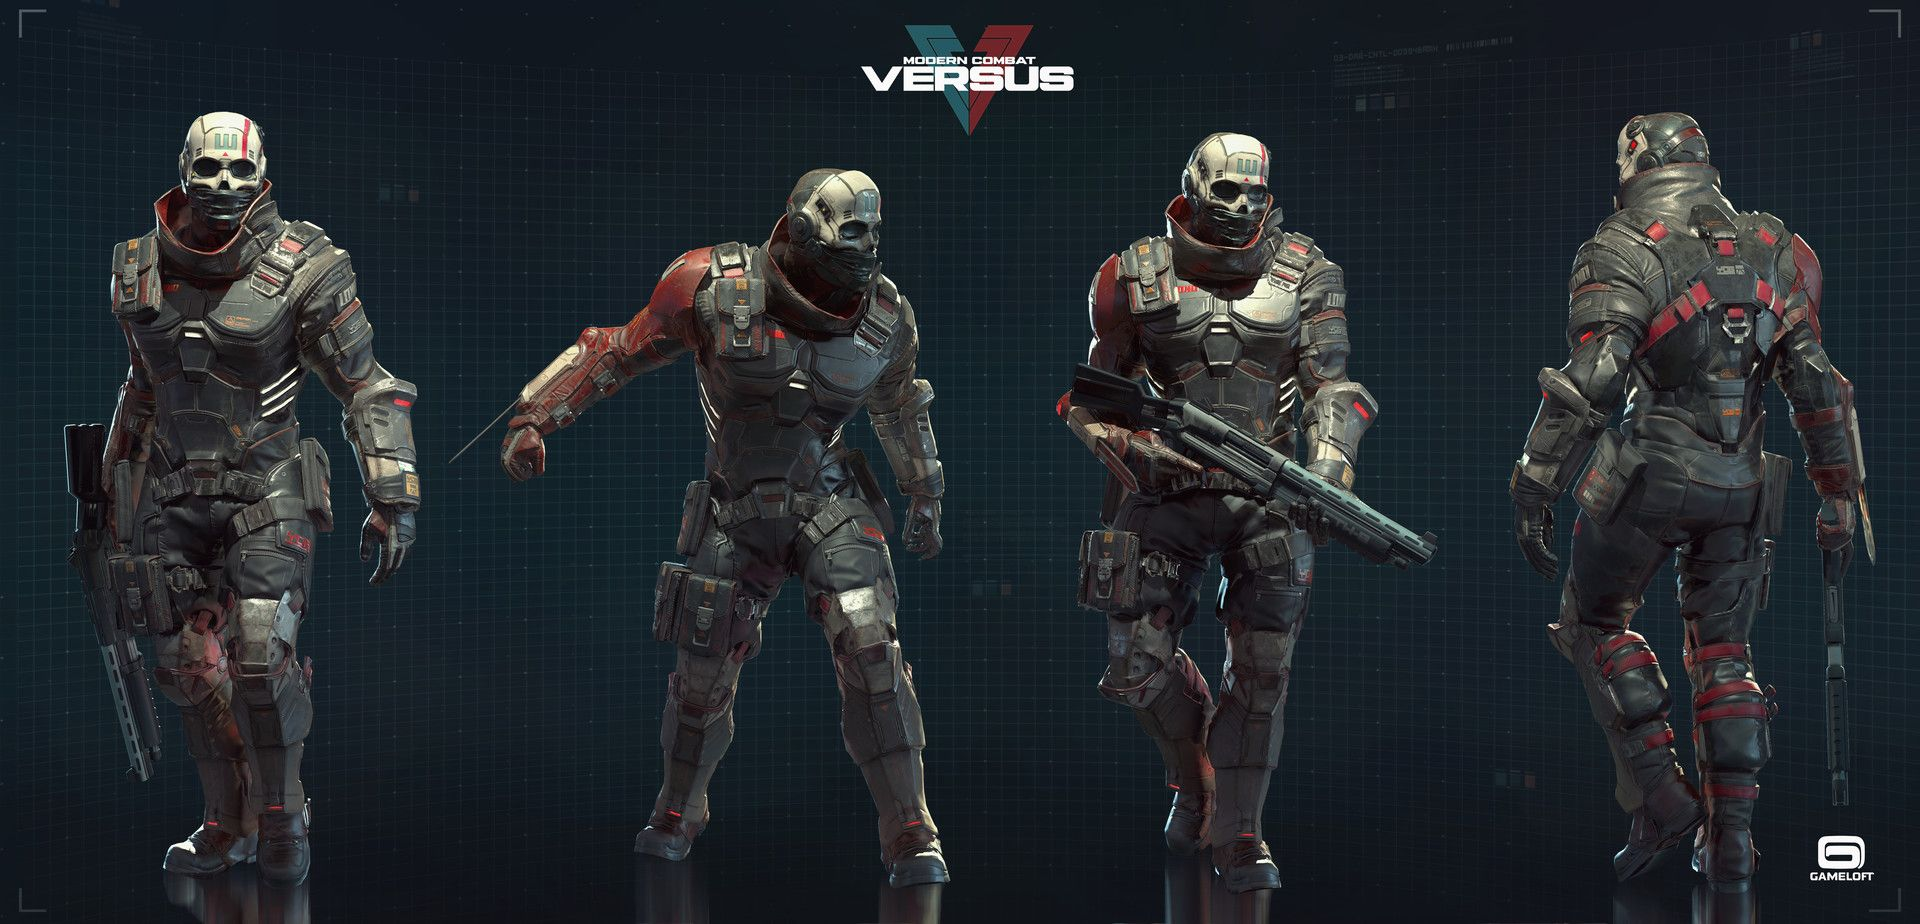 Modern Combat Versus Character Team Art Dump Character Superhero Design Futuristic Art